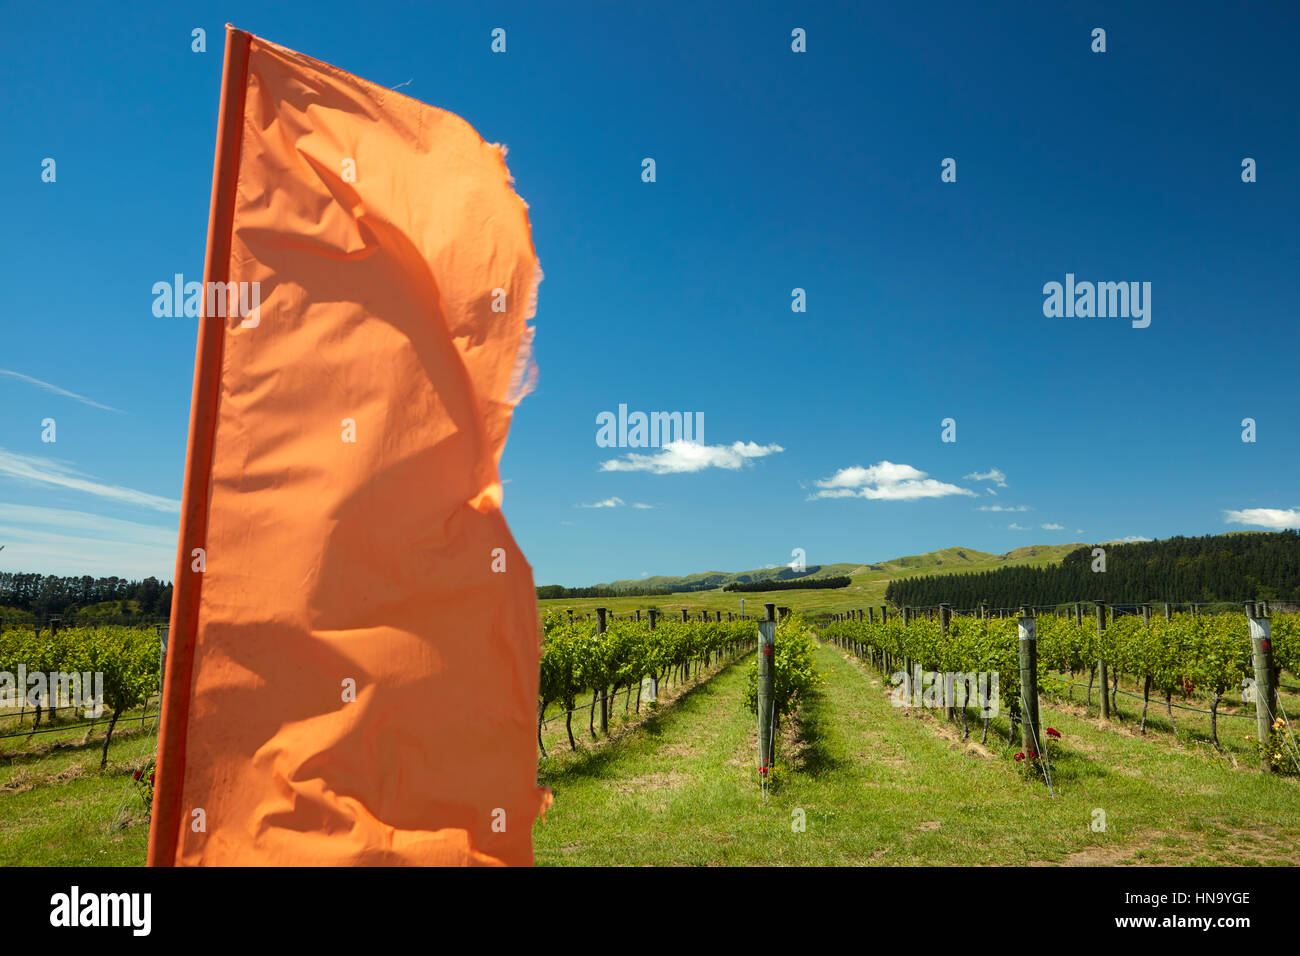 Luna Estate Vineyard, Martinborough, Wairarapa, Lower North Island, Nueva Zelanda Imagen De Stock